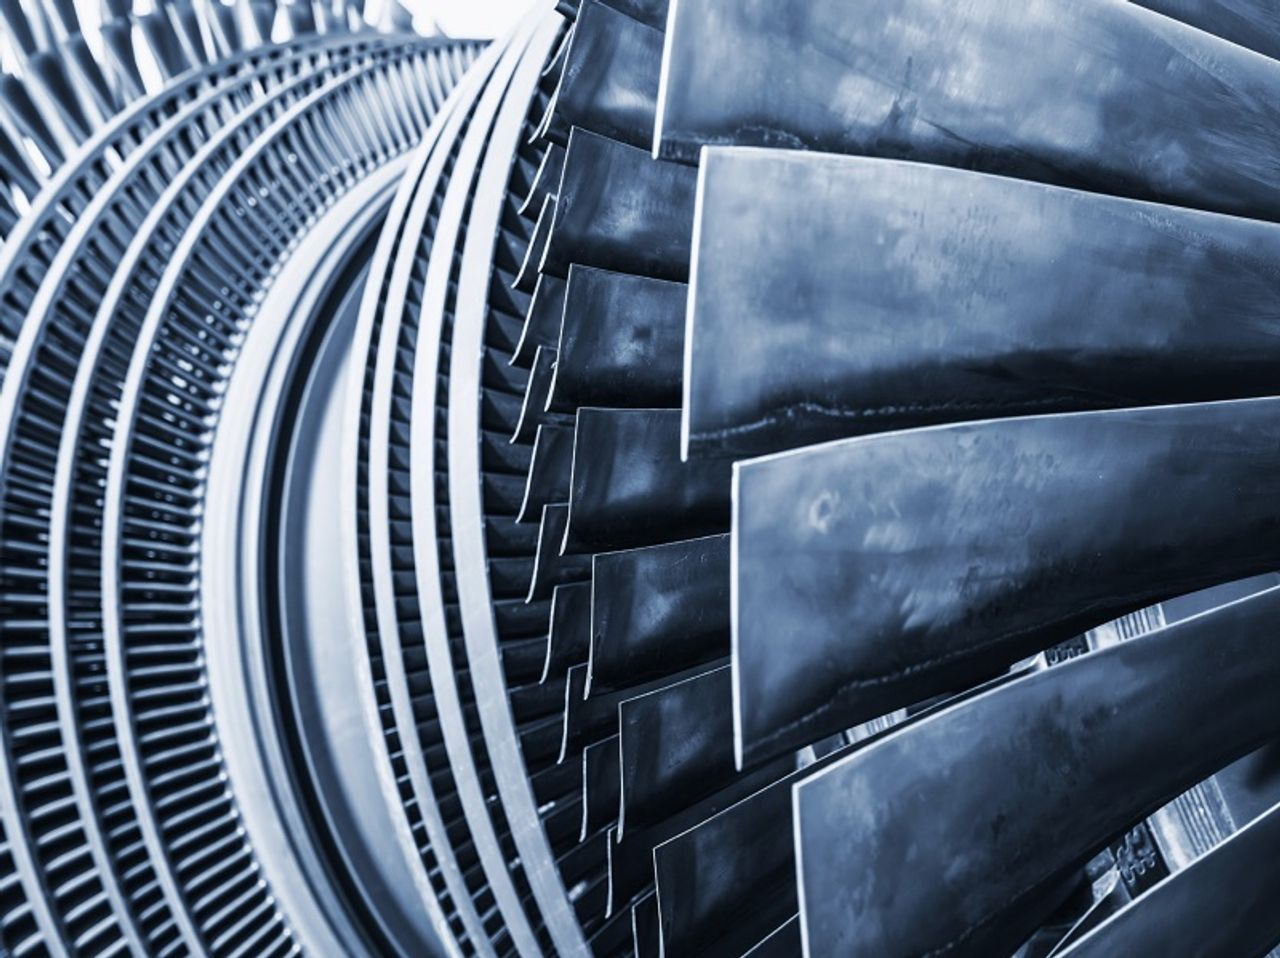 Kundenreferenz, Siemens Gas & Power, Referenz, thyssenkrupp, Turbinen, Industrieanlage, Industrie, Beschaffung